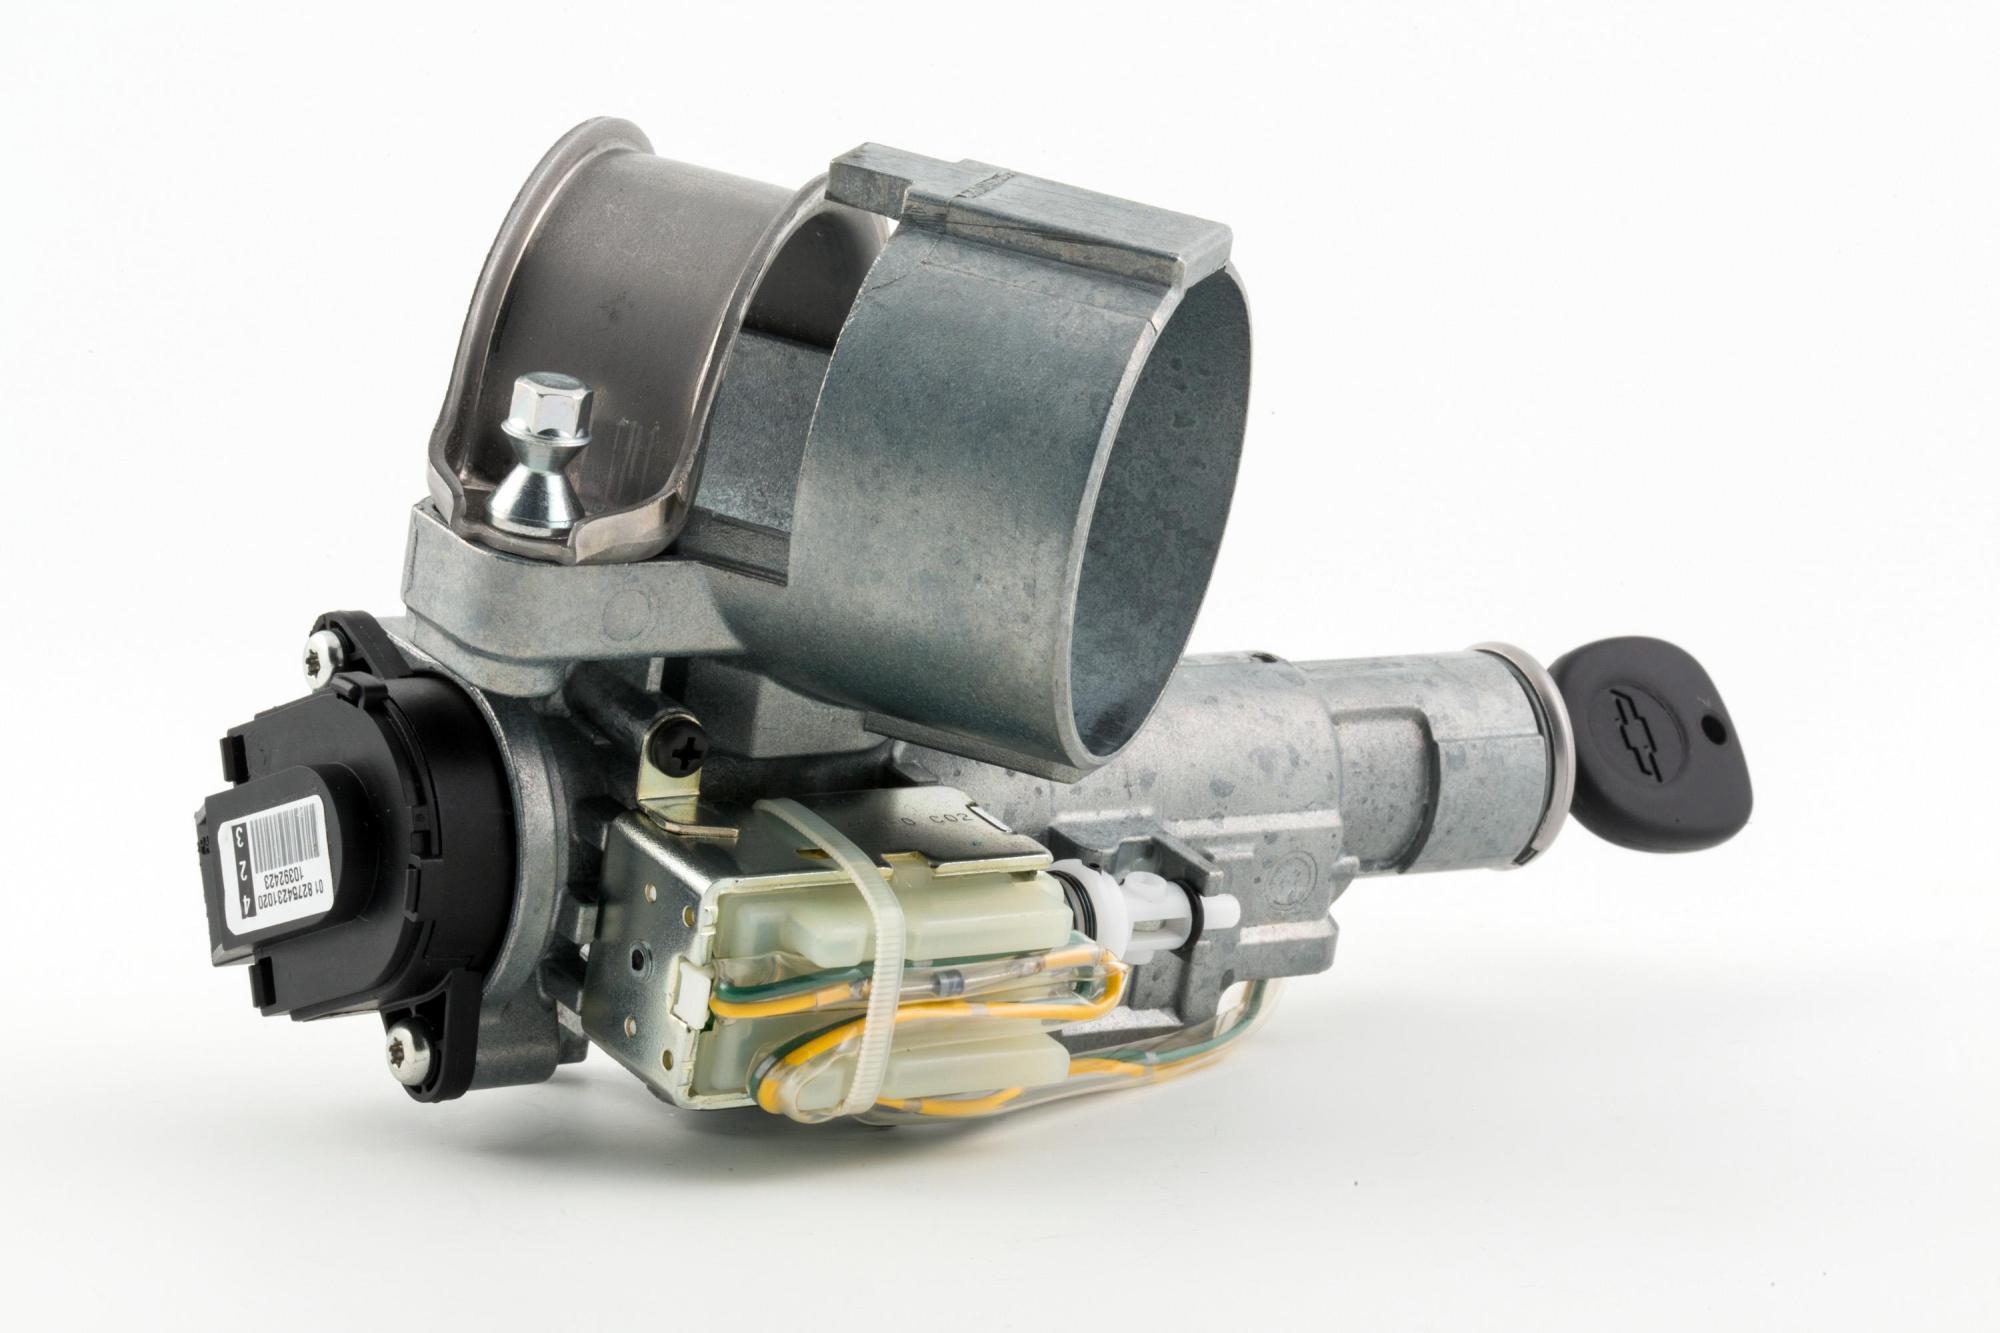 hight resolution of diagram of 2008 hhr s engine